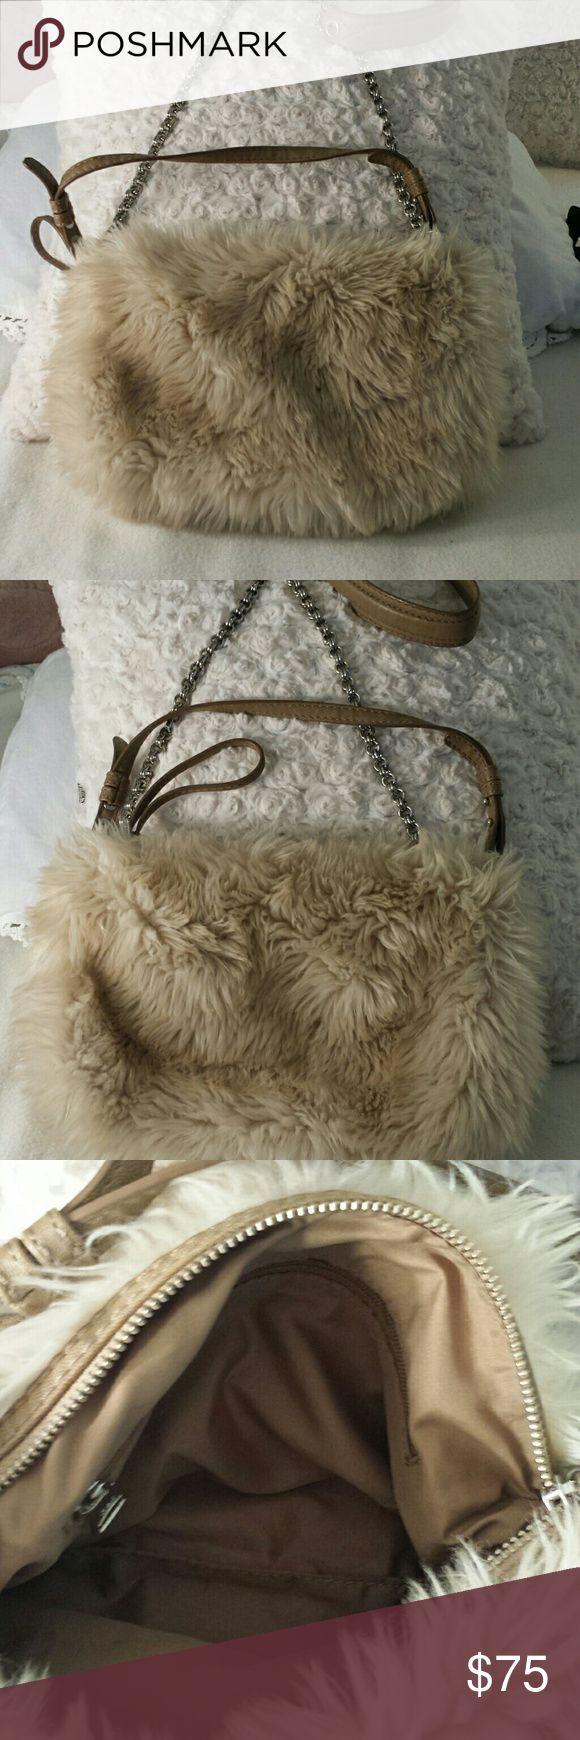 Super cute gap faux fur  crossbody /hand/clutch ba Gap faux fur bag!  Great condition  Unique Gap Bags